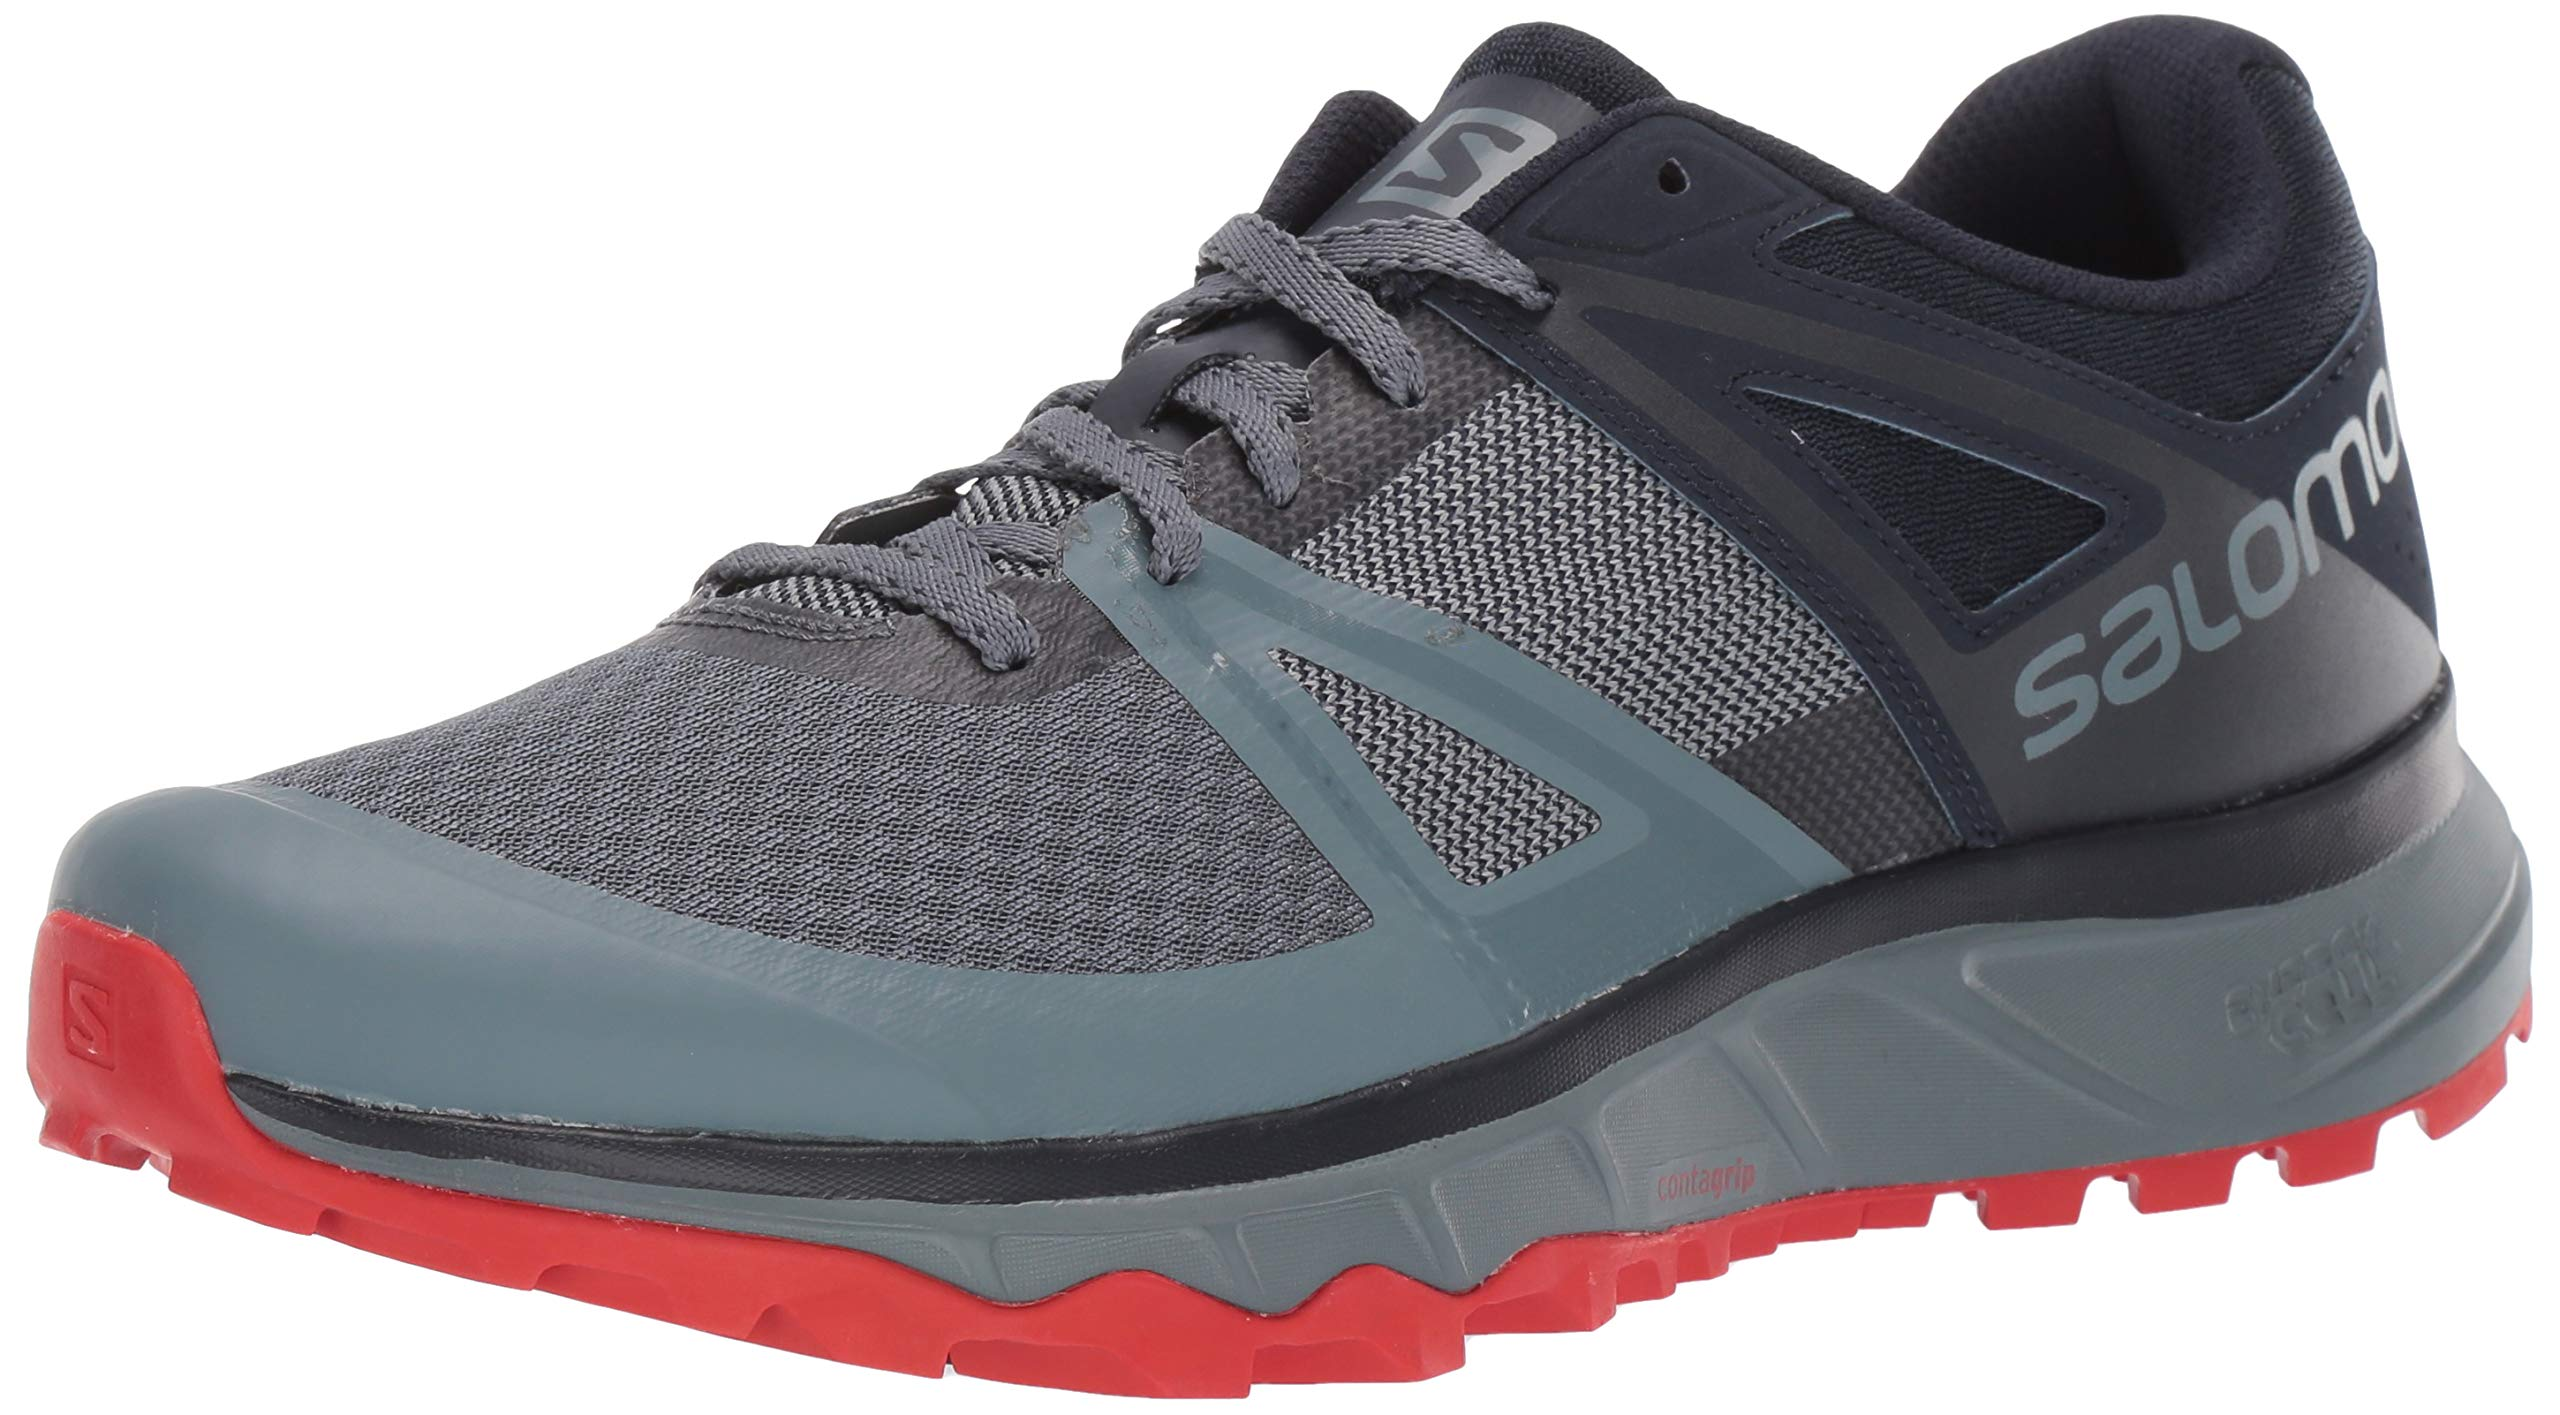 SALOMON Men's TRAILSTER Trail Running Shoe, Stormy Weather/Navy Blazer/Valiant Poppy, 7.5 by SALOMON